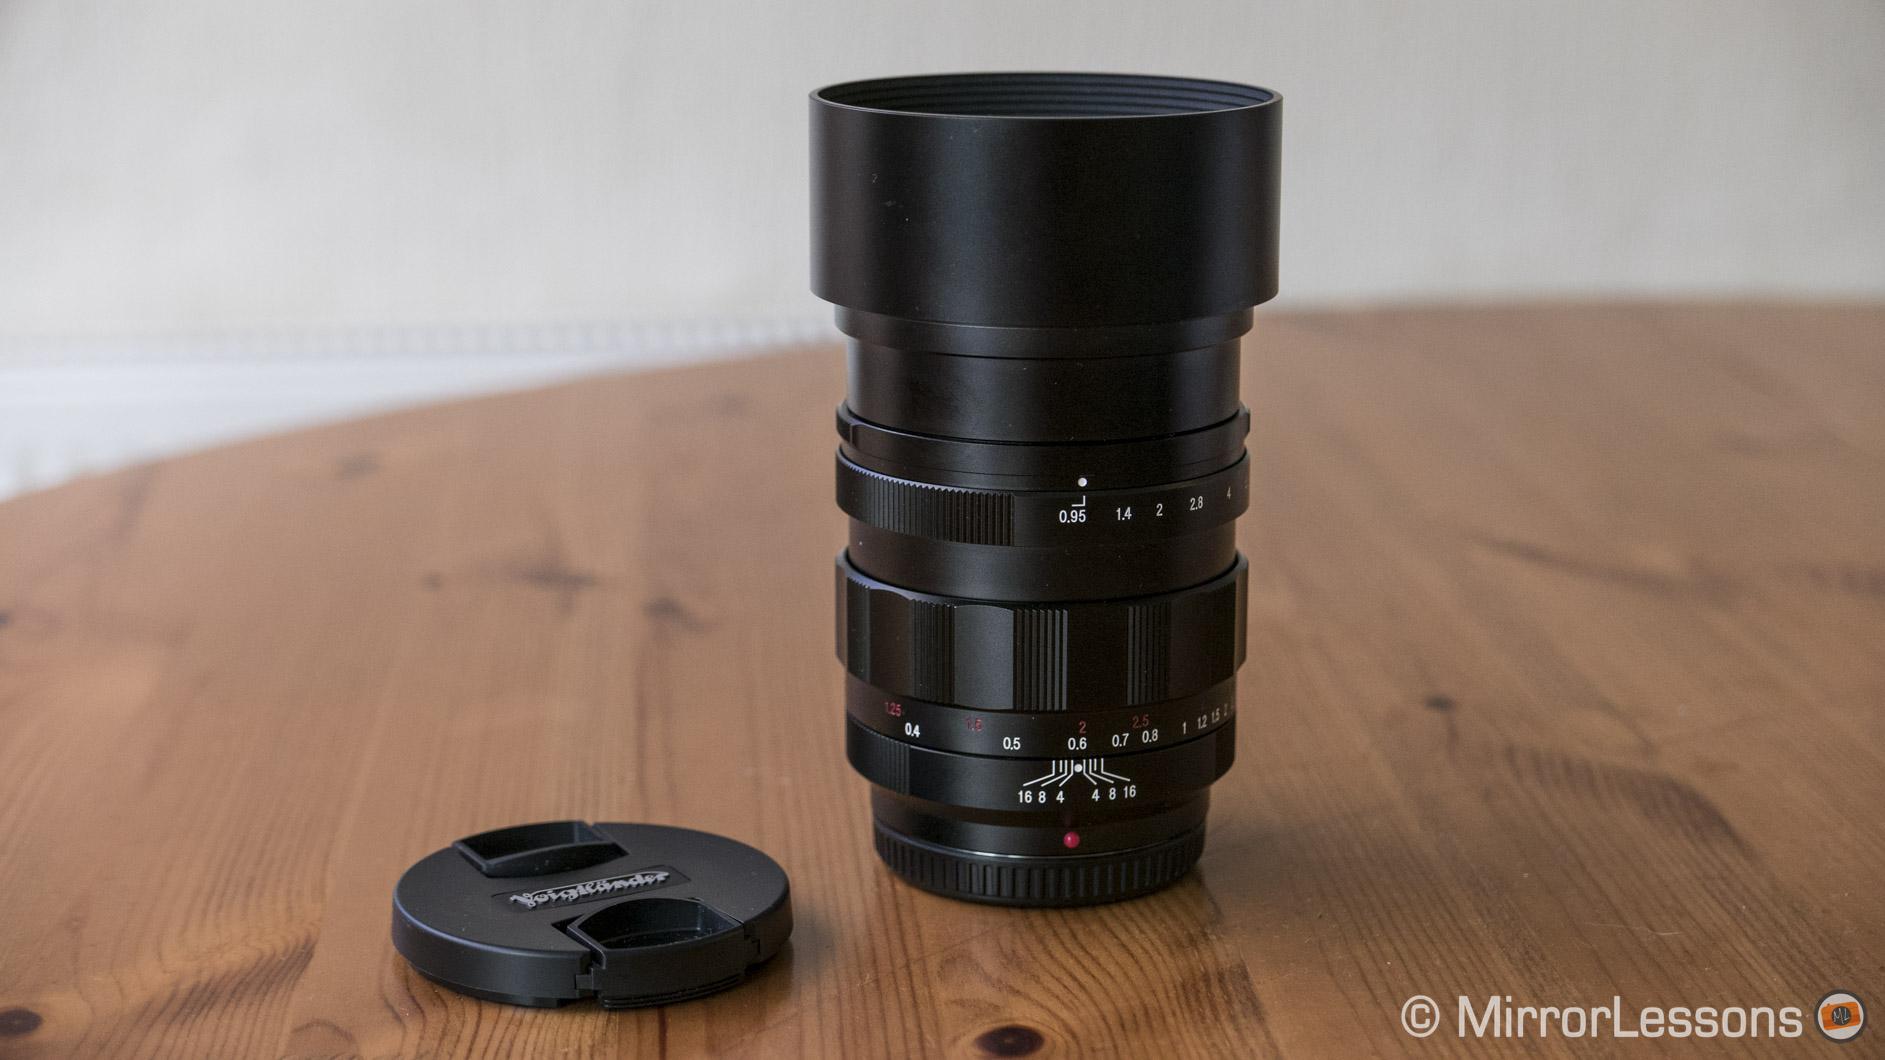 voigtlander 42.5mm f/0.95 review